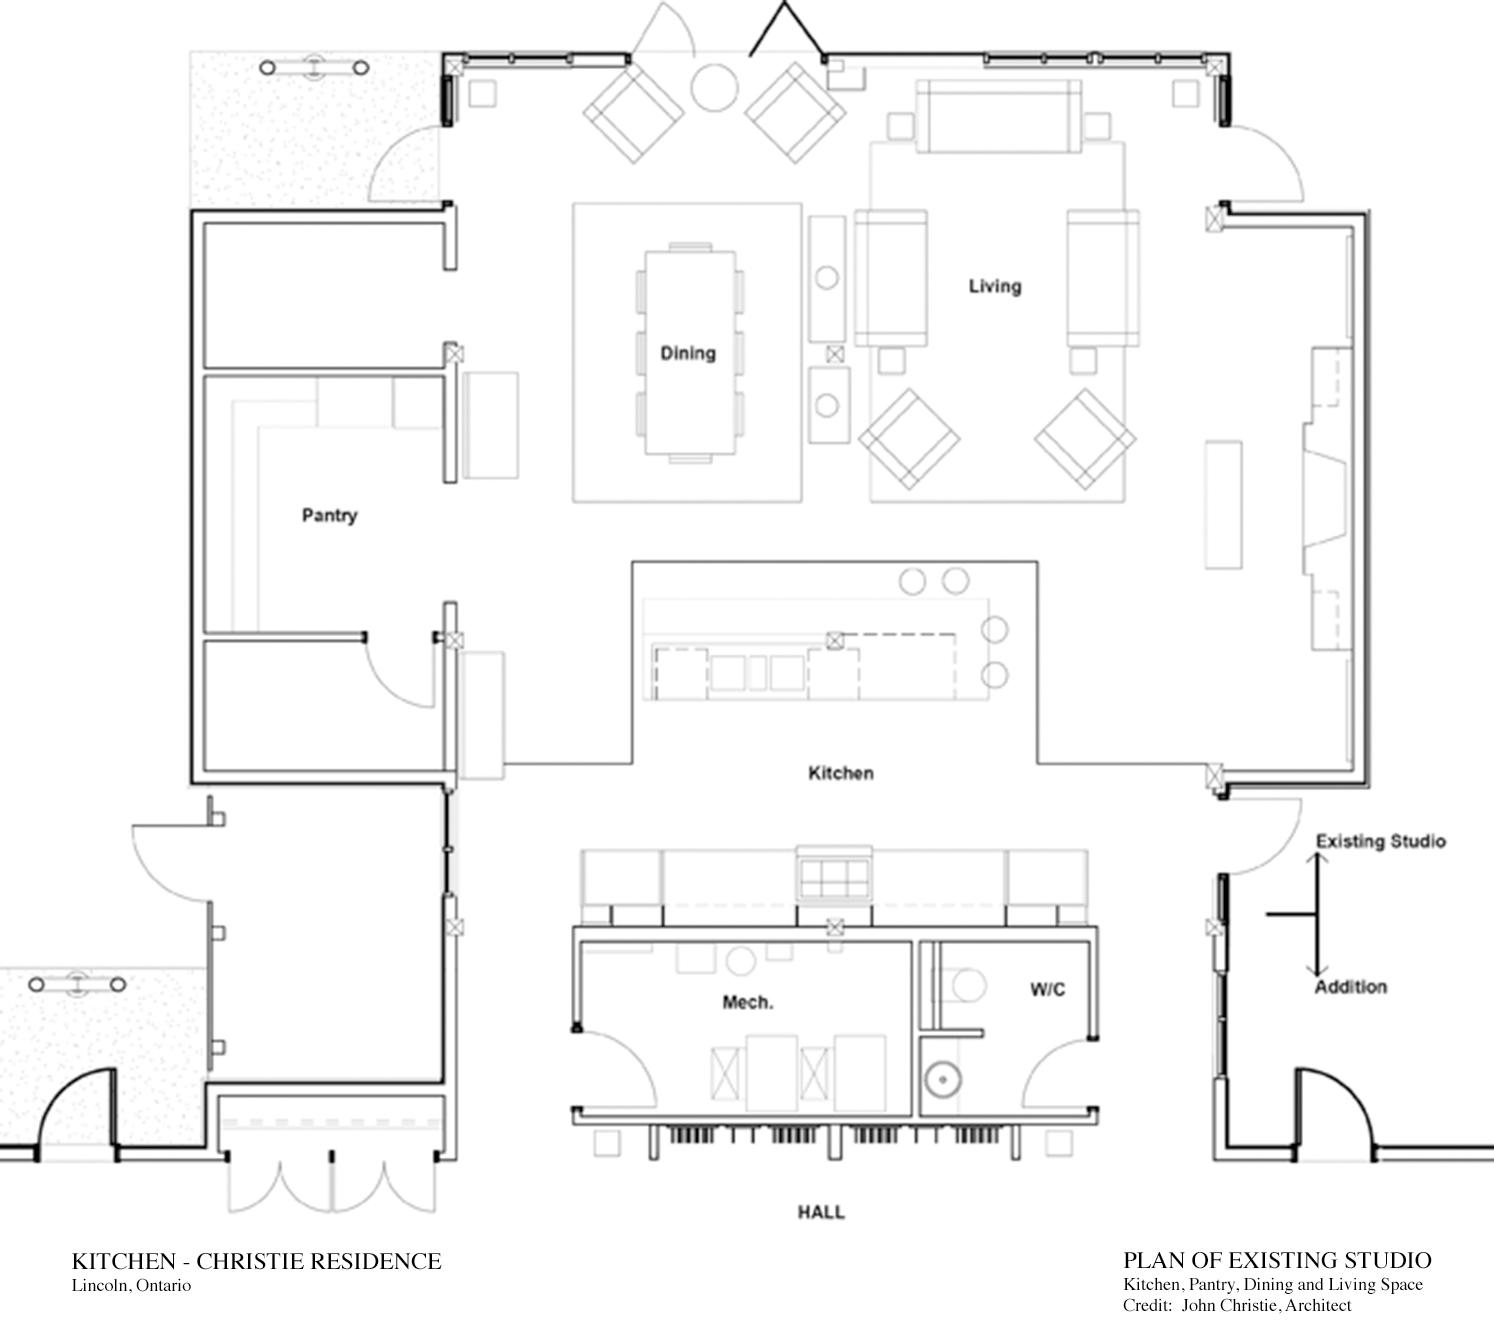 Plan of Existing Studio Architect